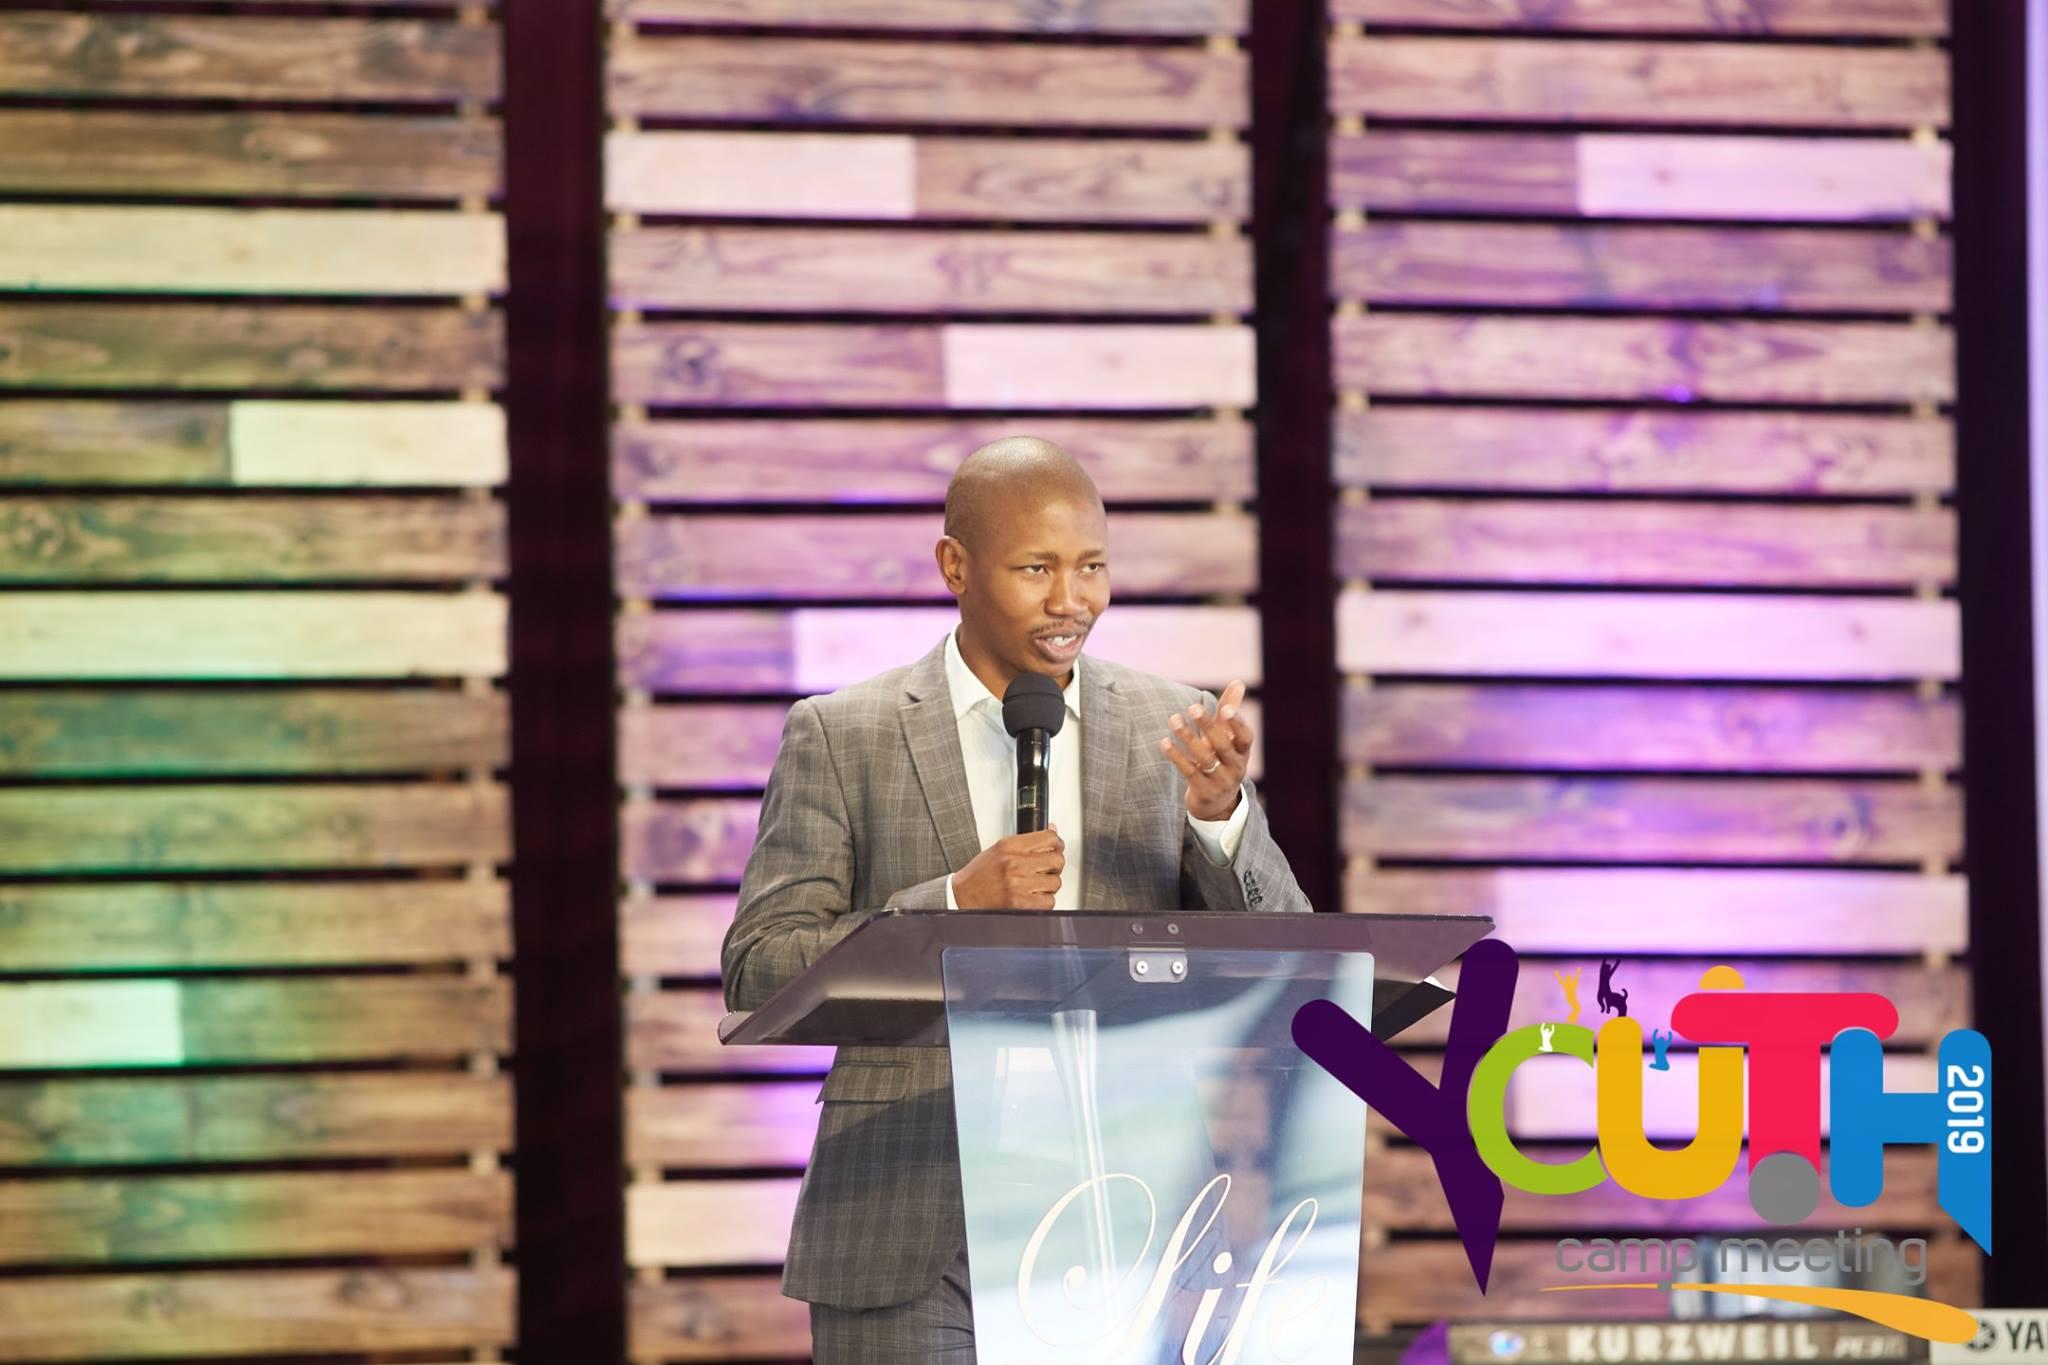 """Changing The World With Jesus"" – Mr Tapiwa Chizana (UFIC Youth Camp 2019)"